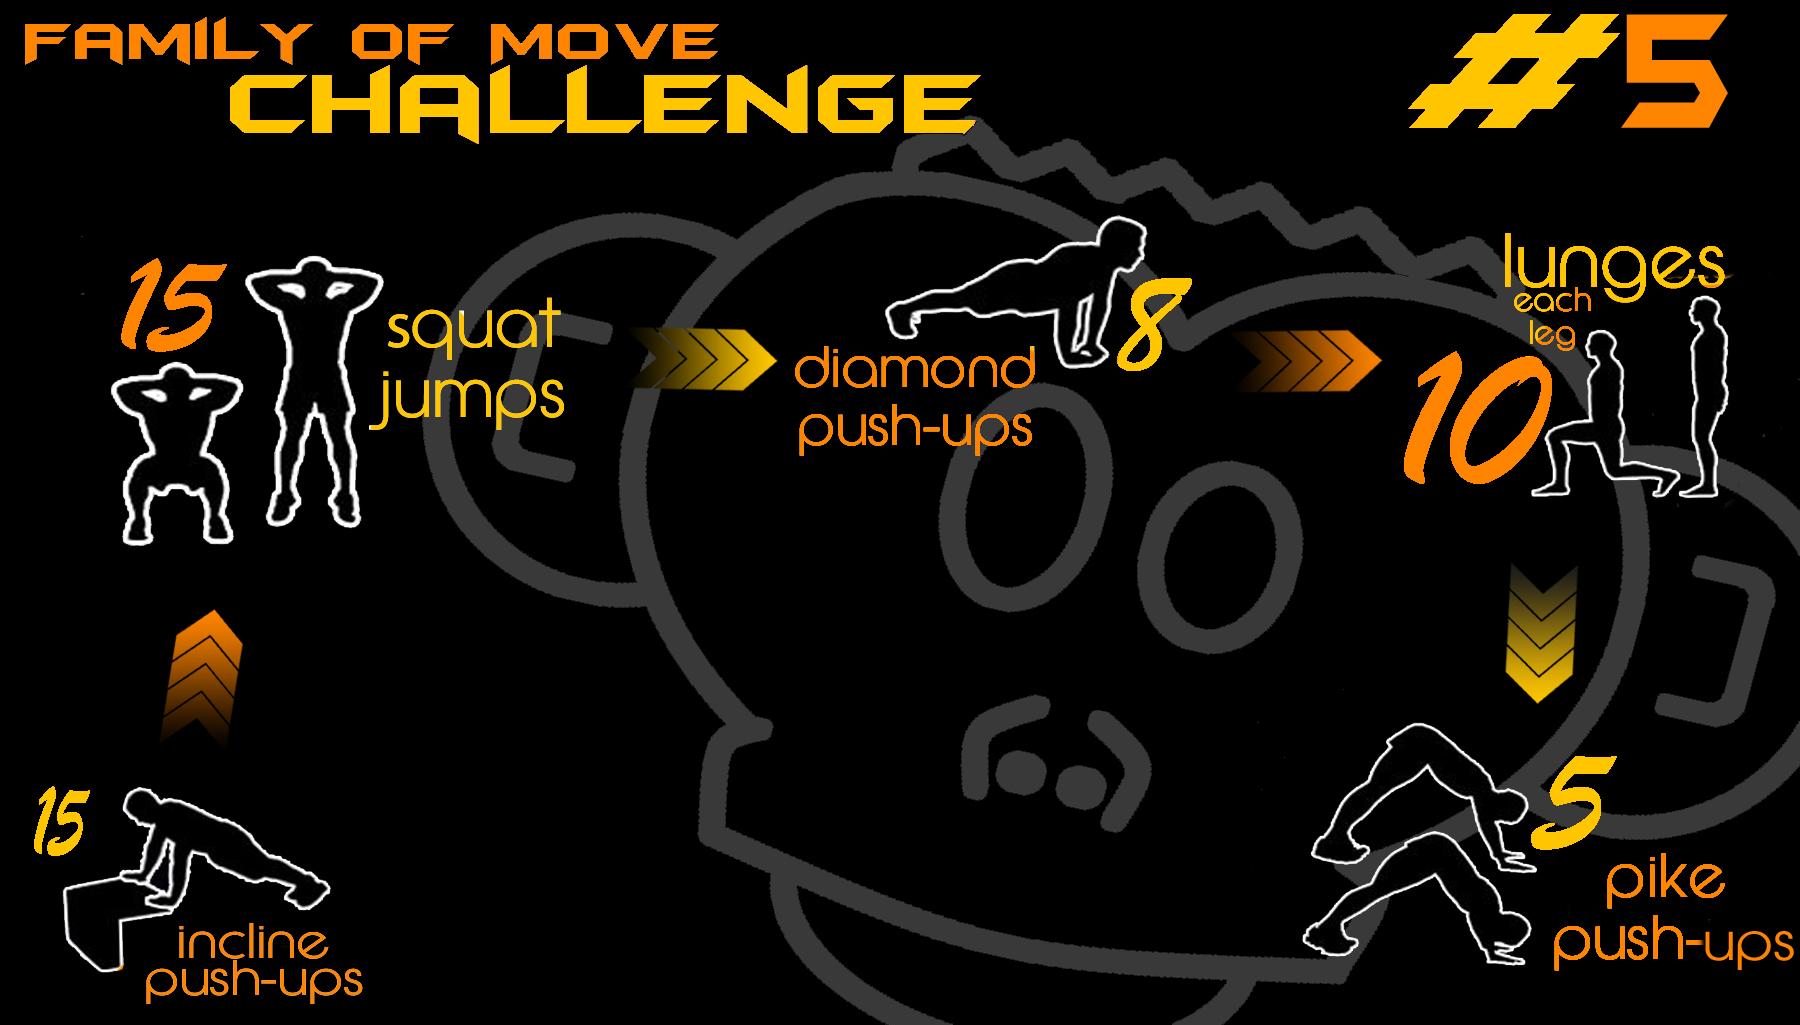 FamilyOfMove-challenge-5